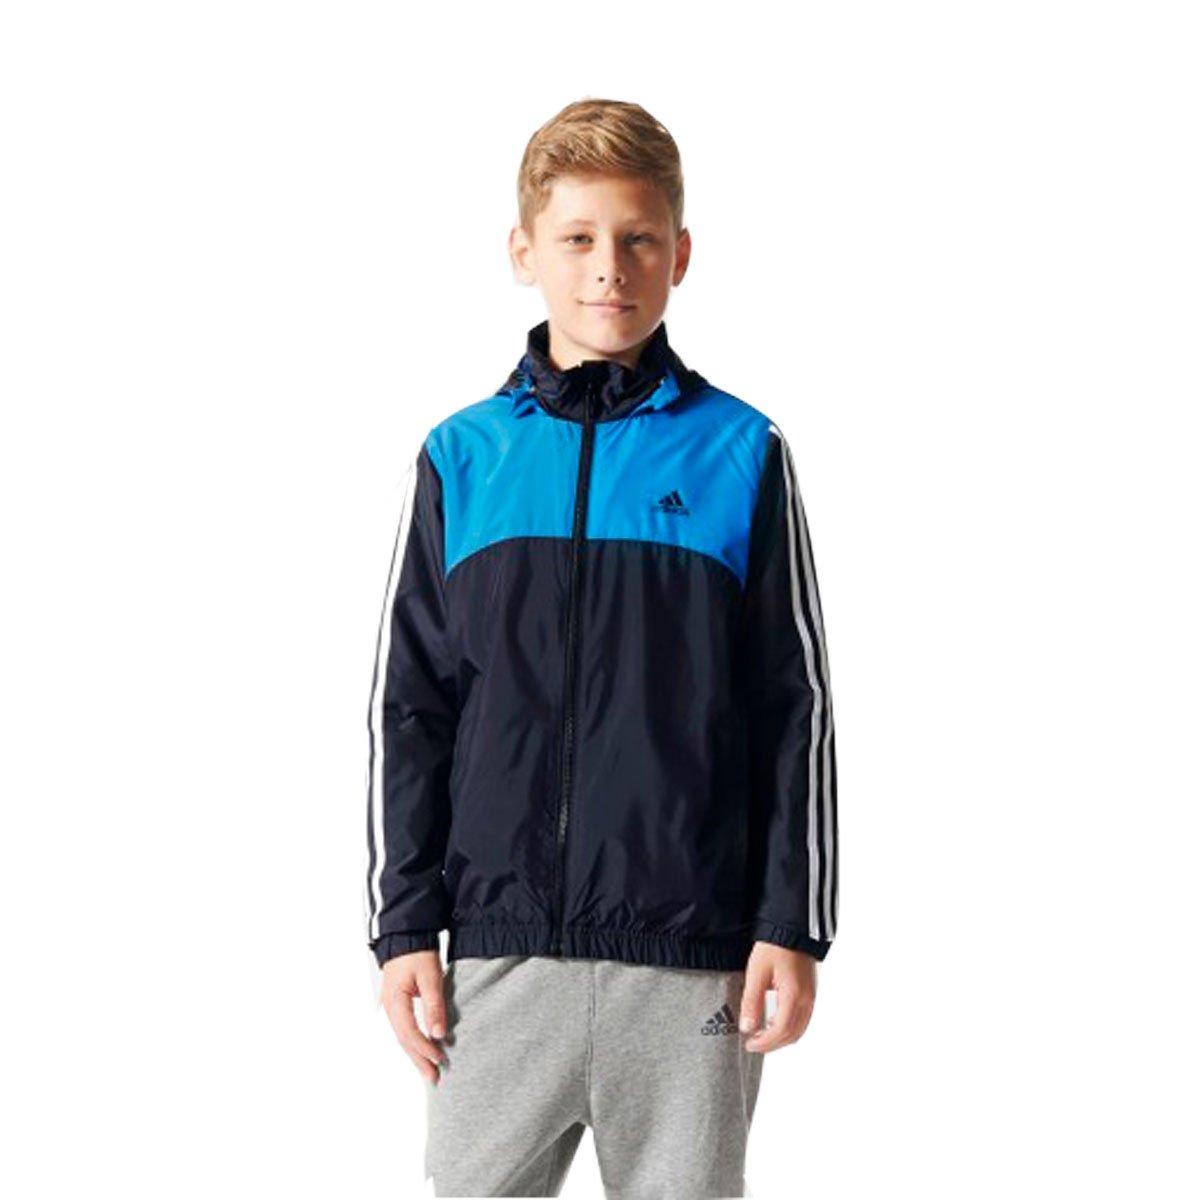 32aa61787c8 Bizz Store - Jaqueta Infantil Masculina Adidas YB ESS WB Cinza